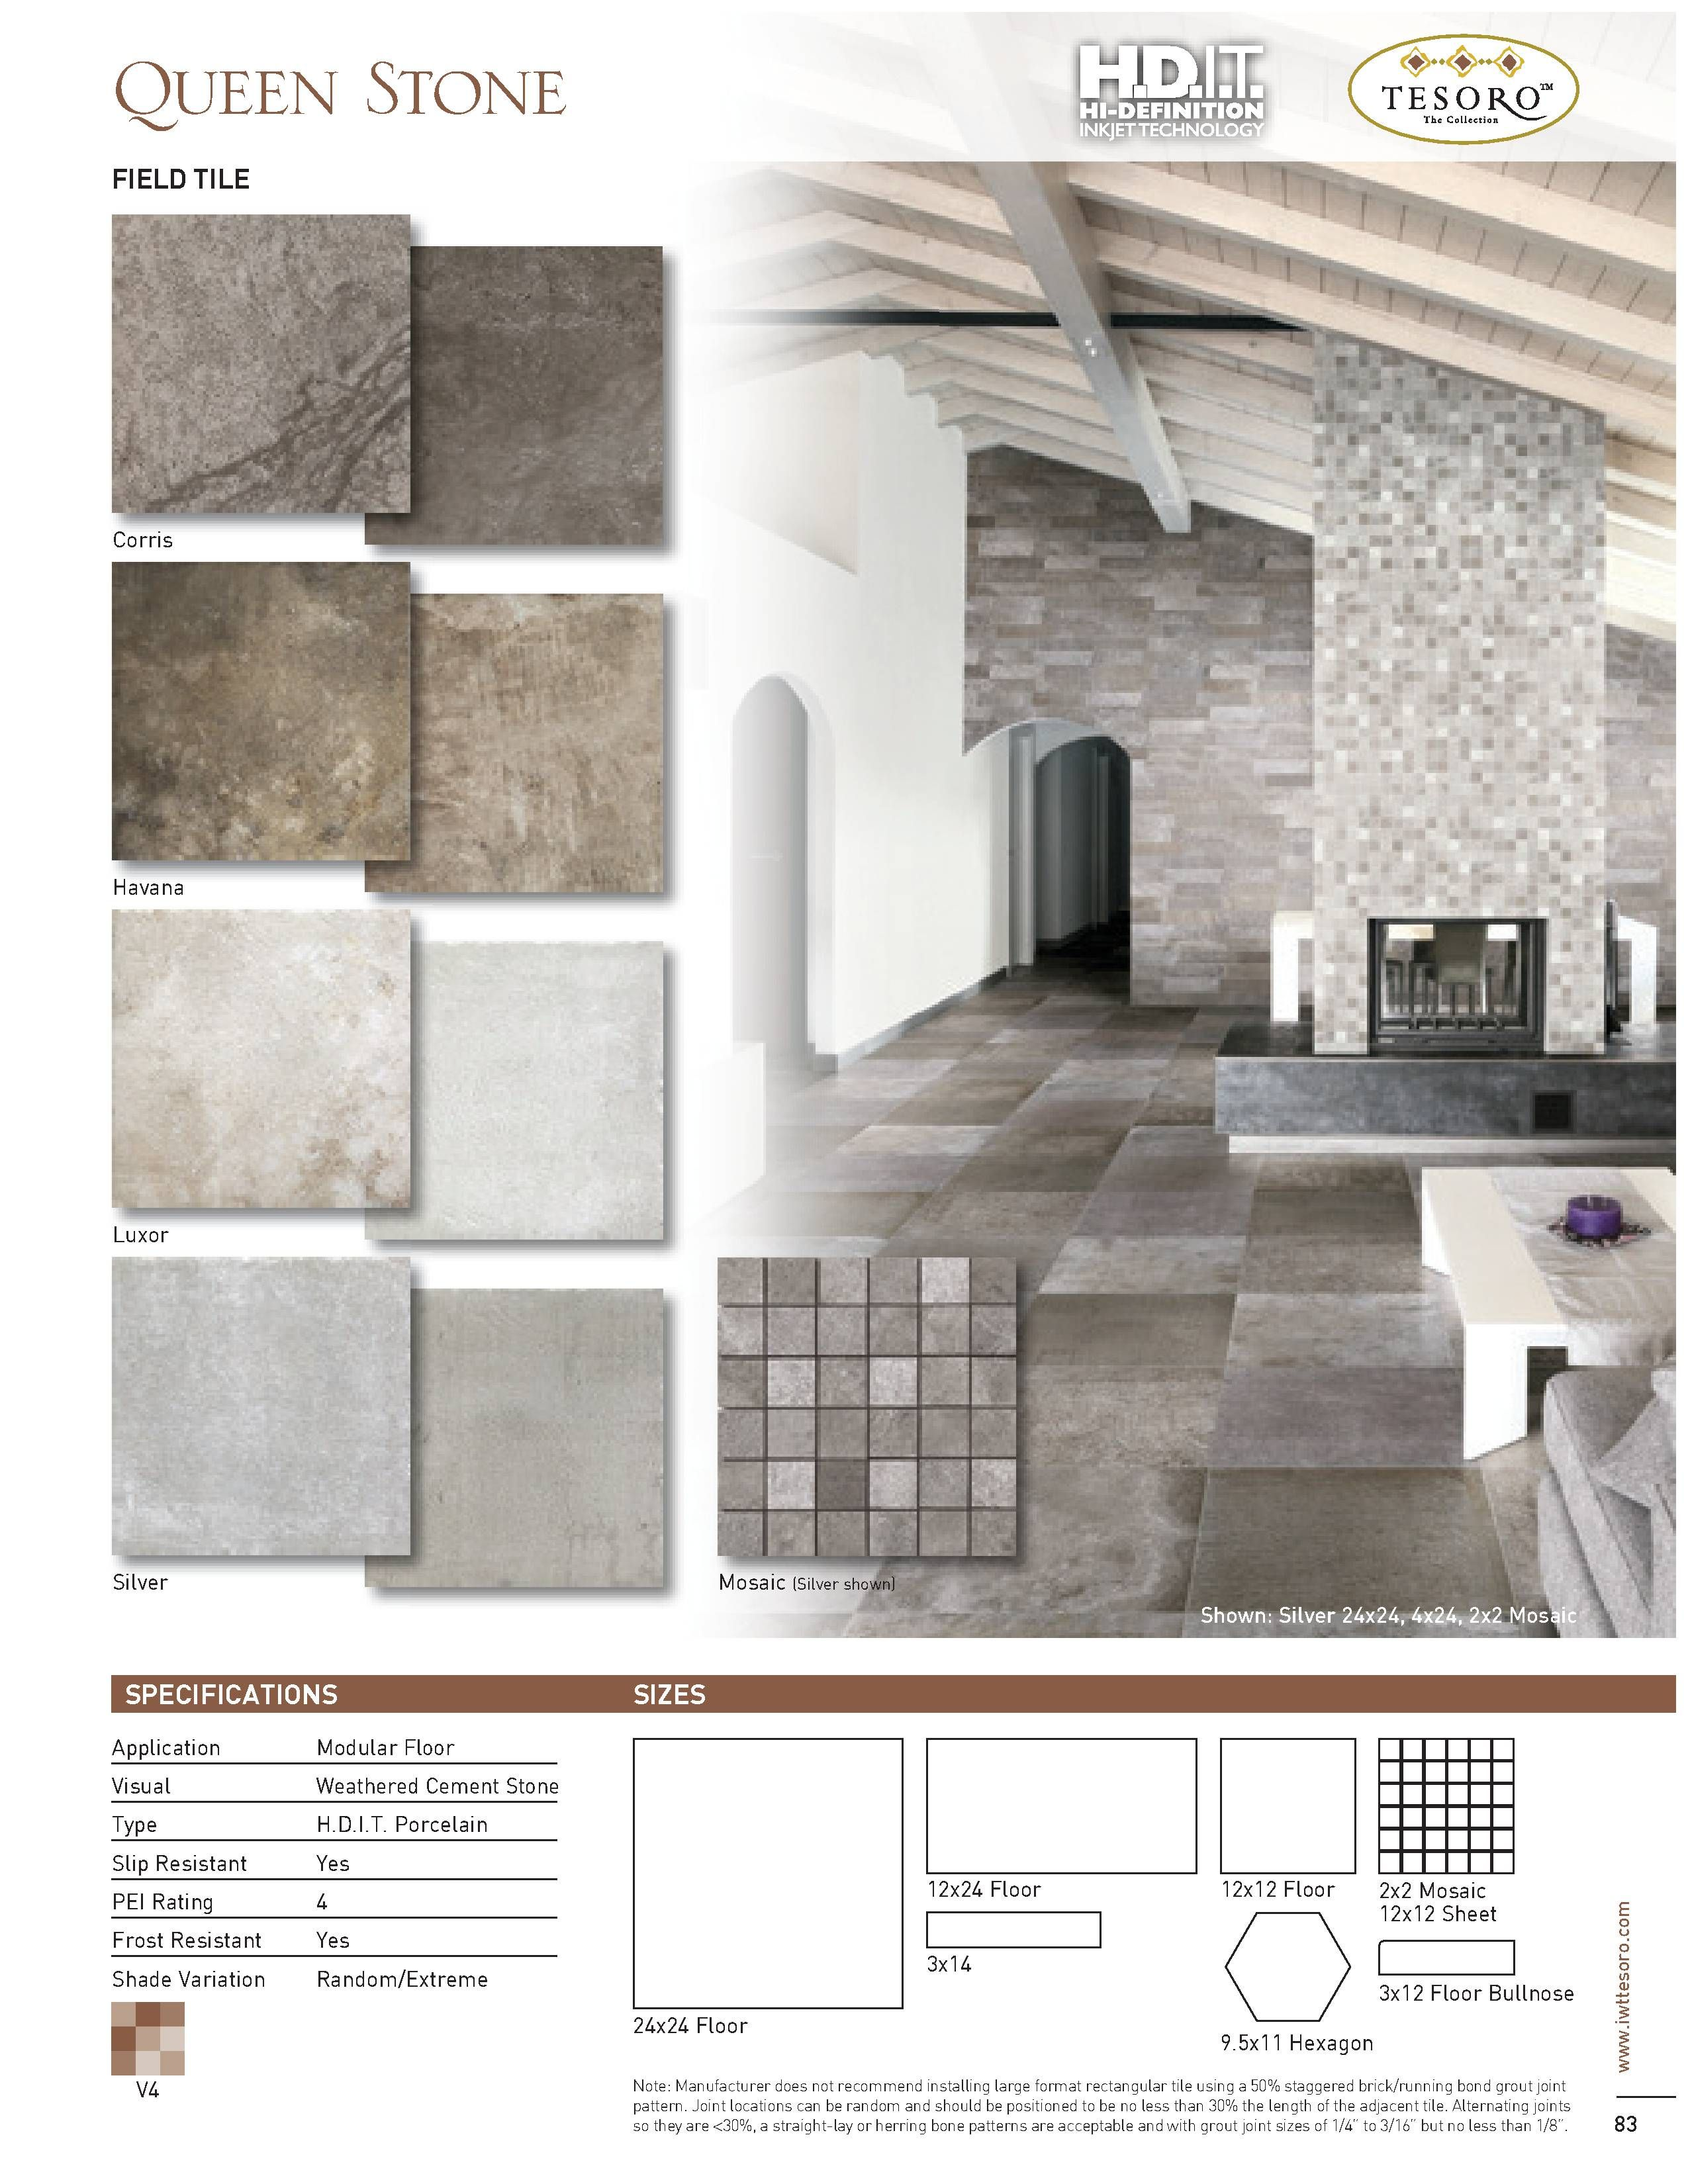 tesoro queen stone brochure floors tile flats mosaics tiles flooring  [ 2550 x 3300 Pixel ]